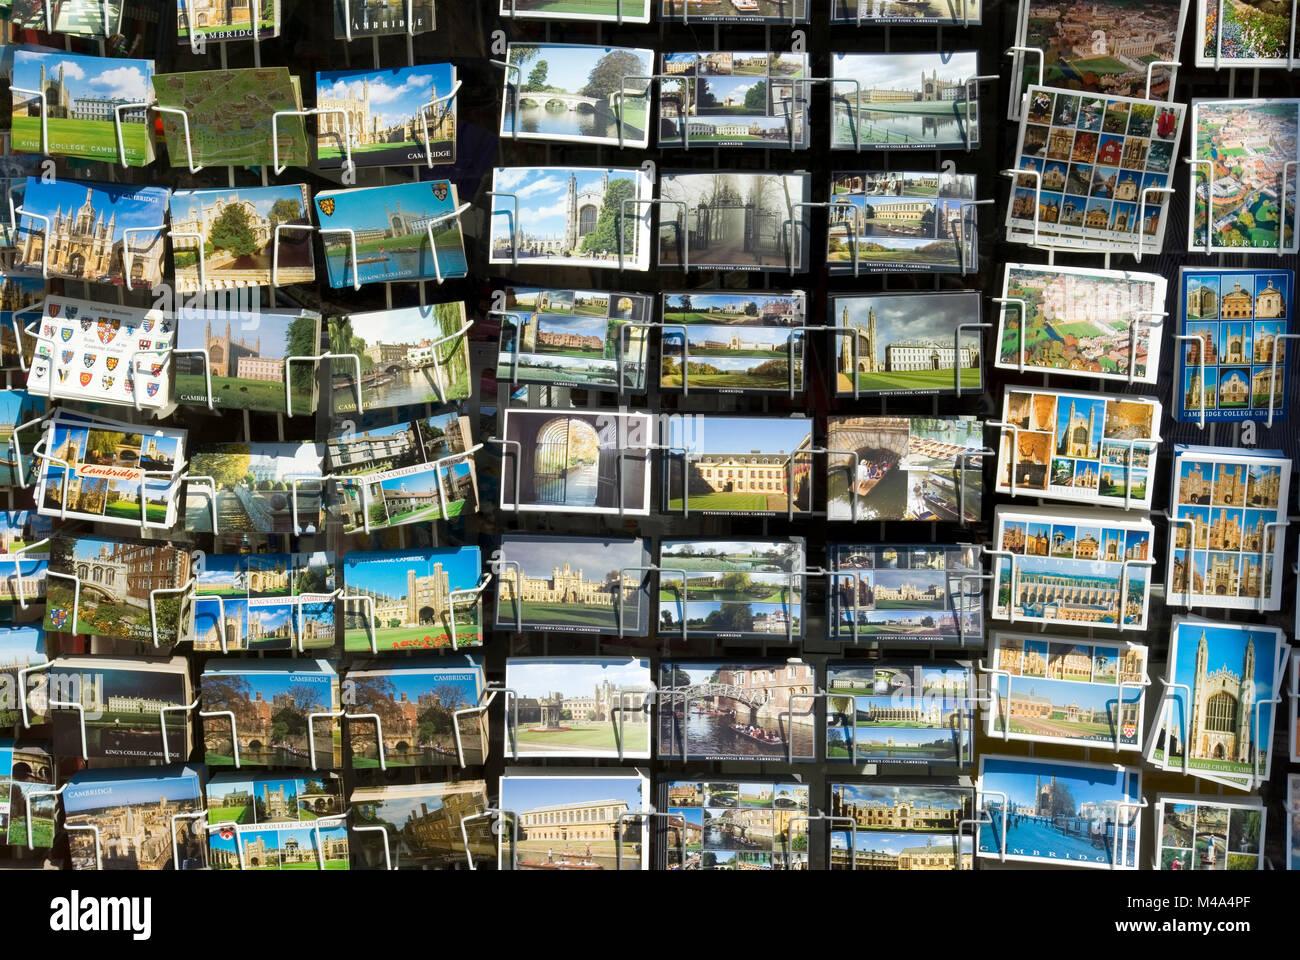 Postcards for sale Cambridge - Stock Image